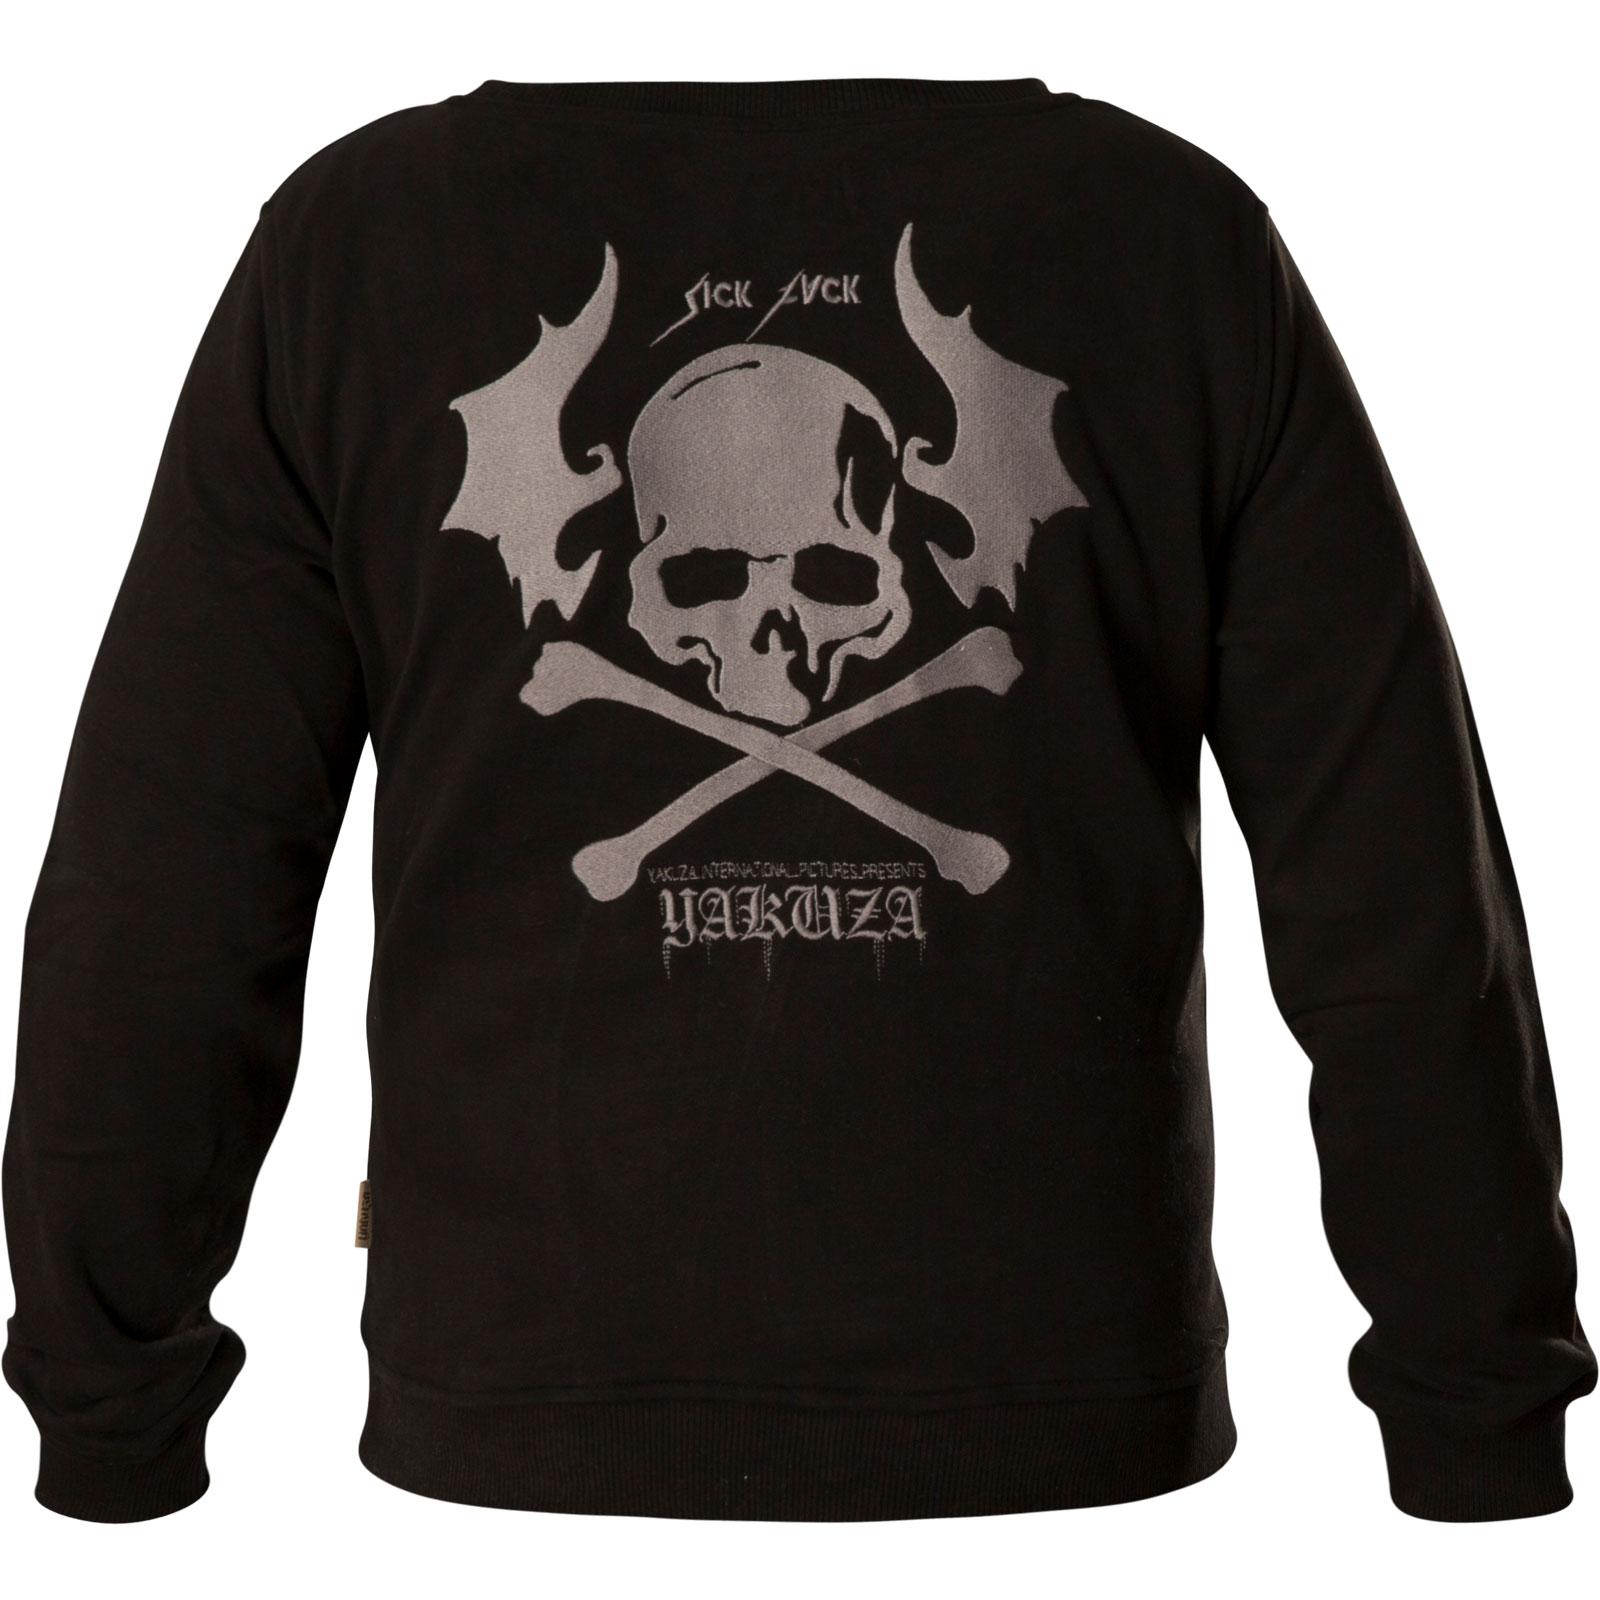 ed8e68fb1d69b5 ... Yakuza Damen Pullover Flying Skull Cropped Sweater GPB-13109 Black  Schwarz ...